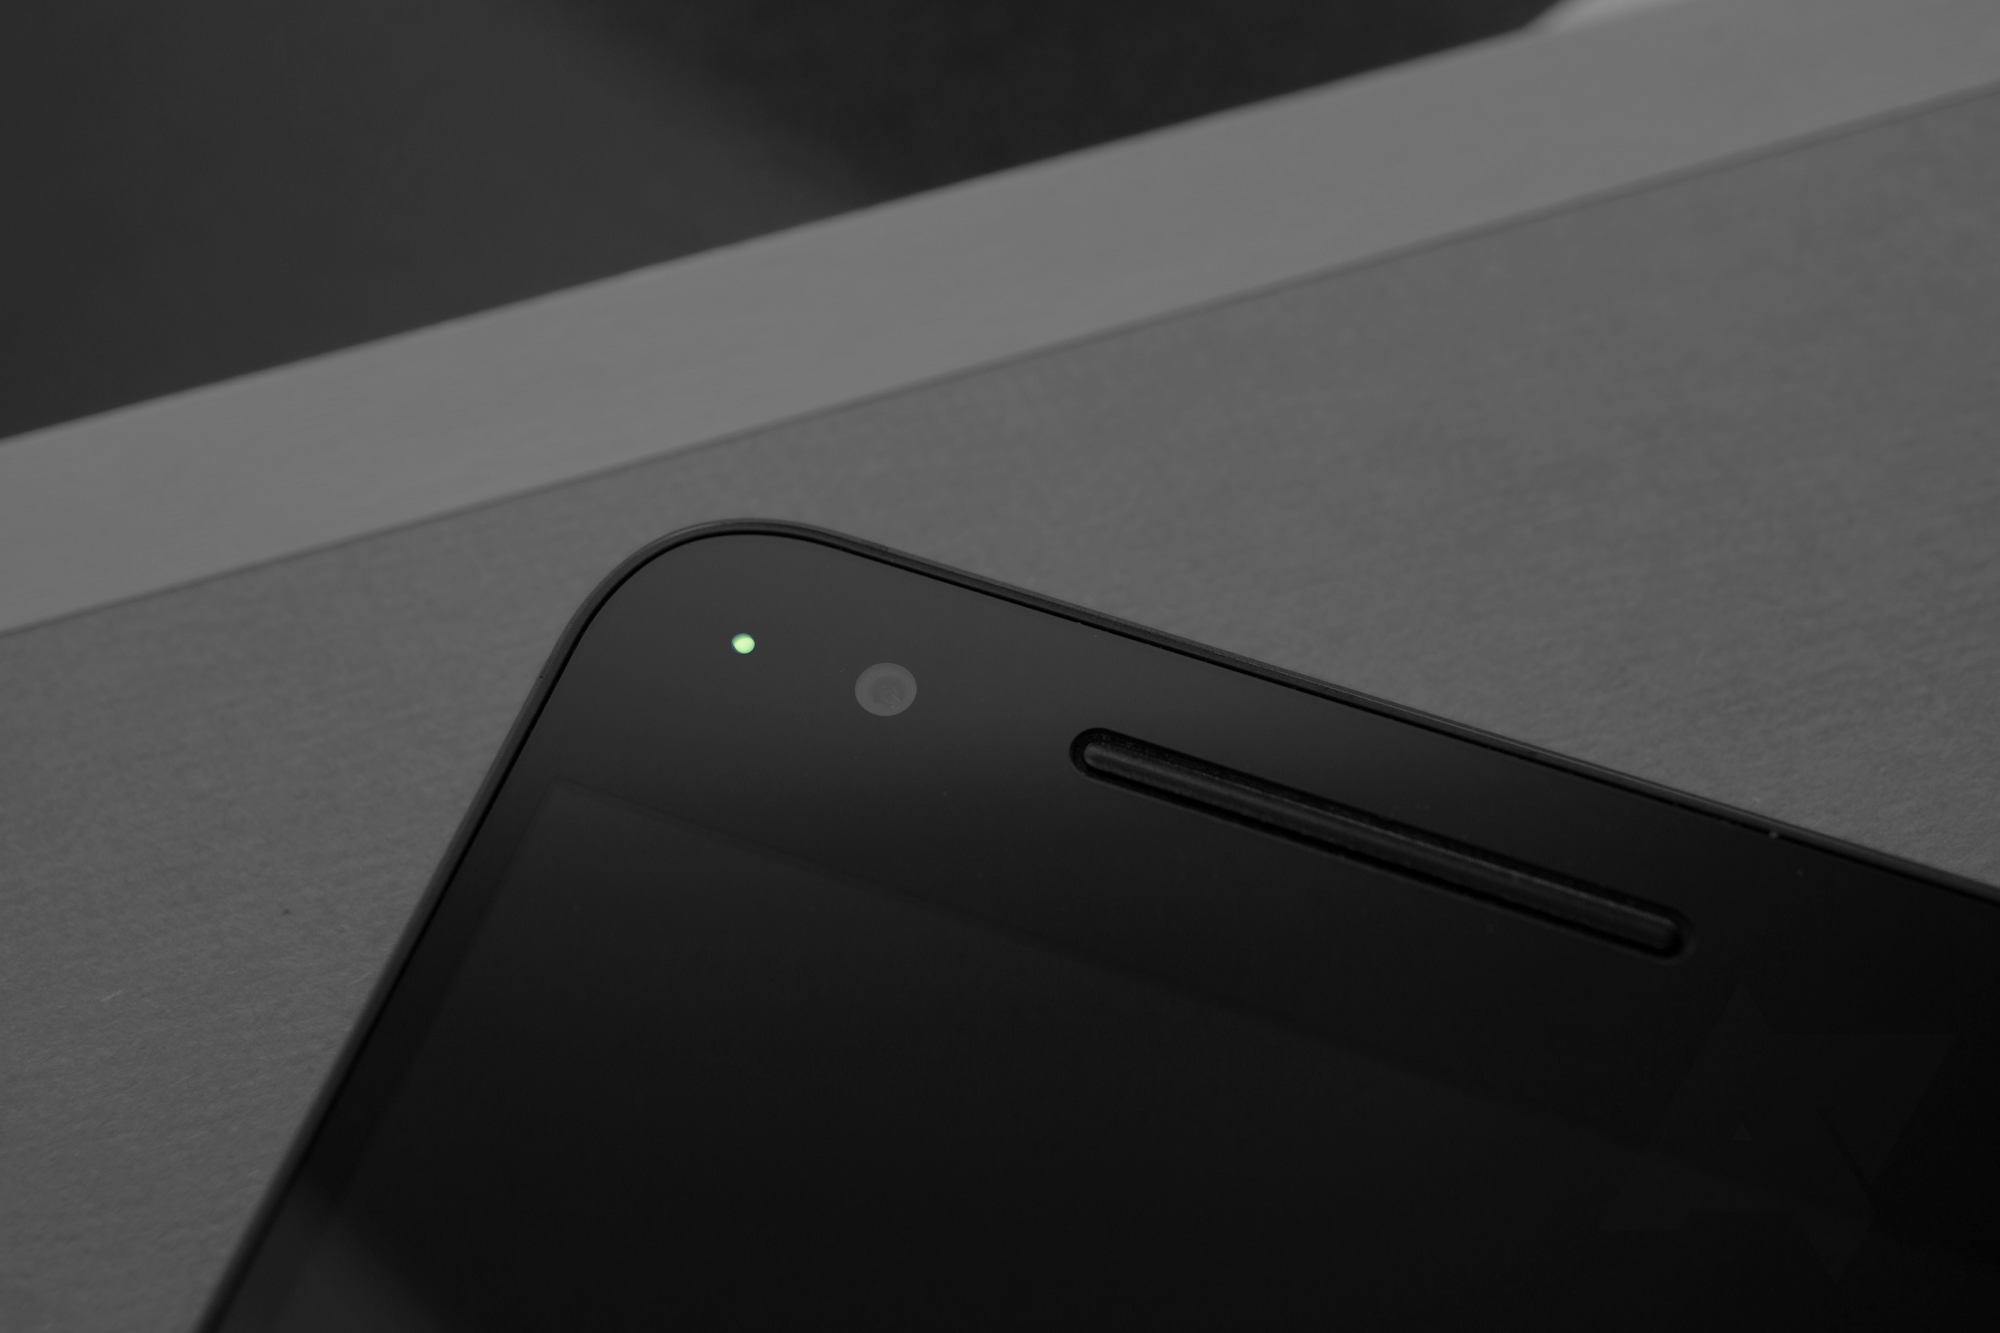 black and white phone.jpg